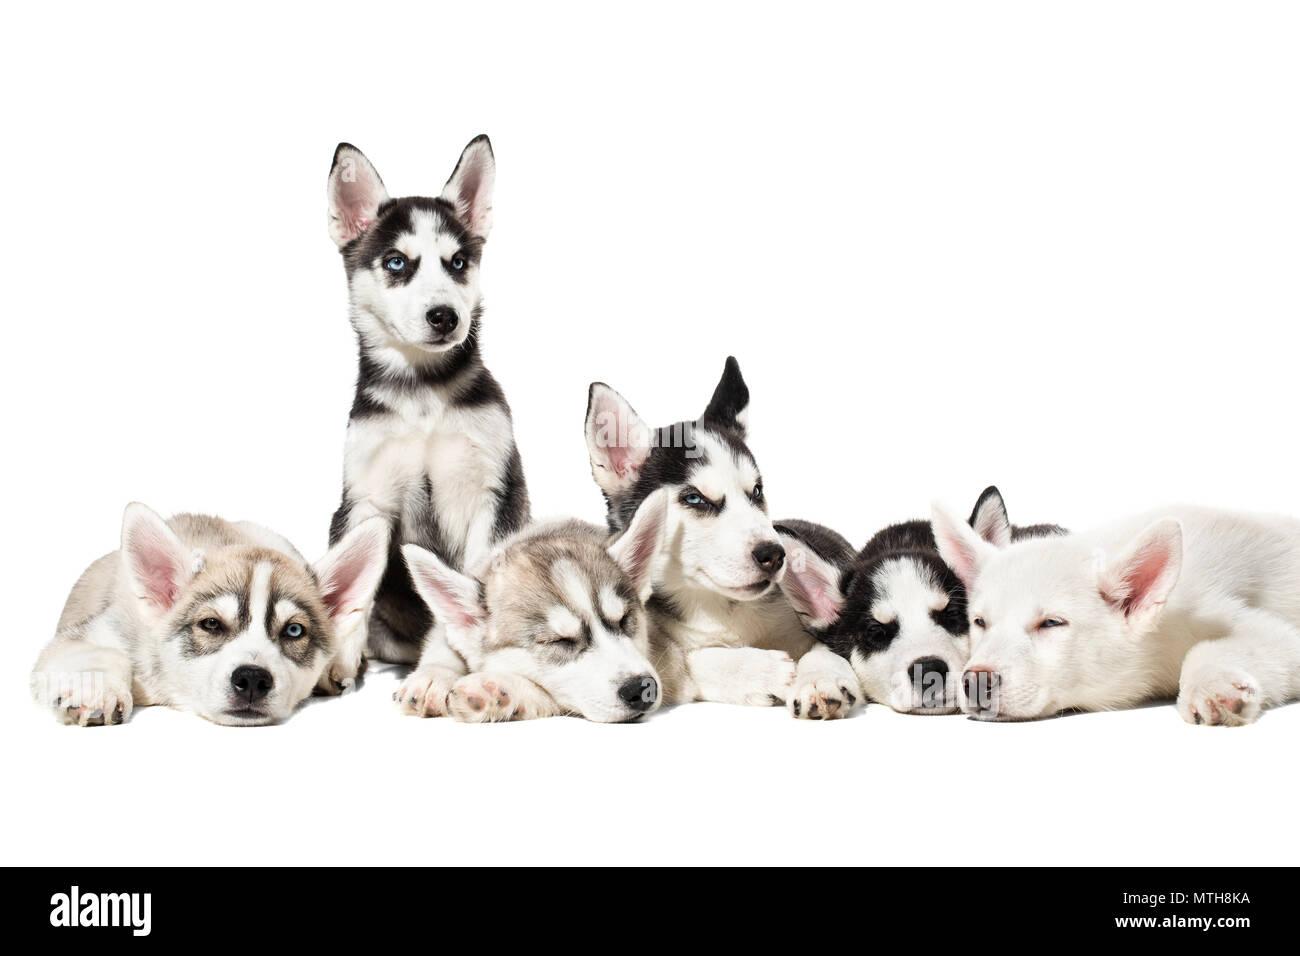 Cute Siberian husky puppies on white background. Stock Photo